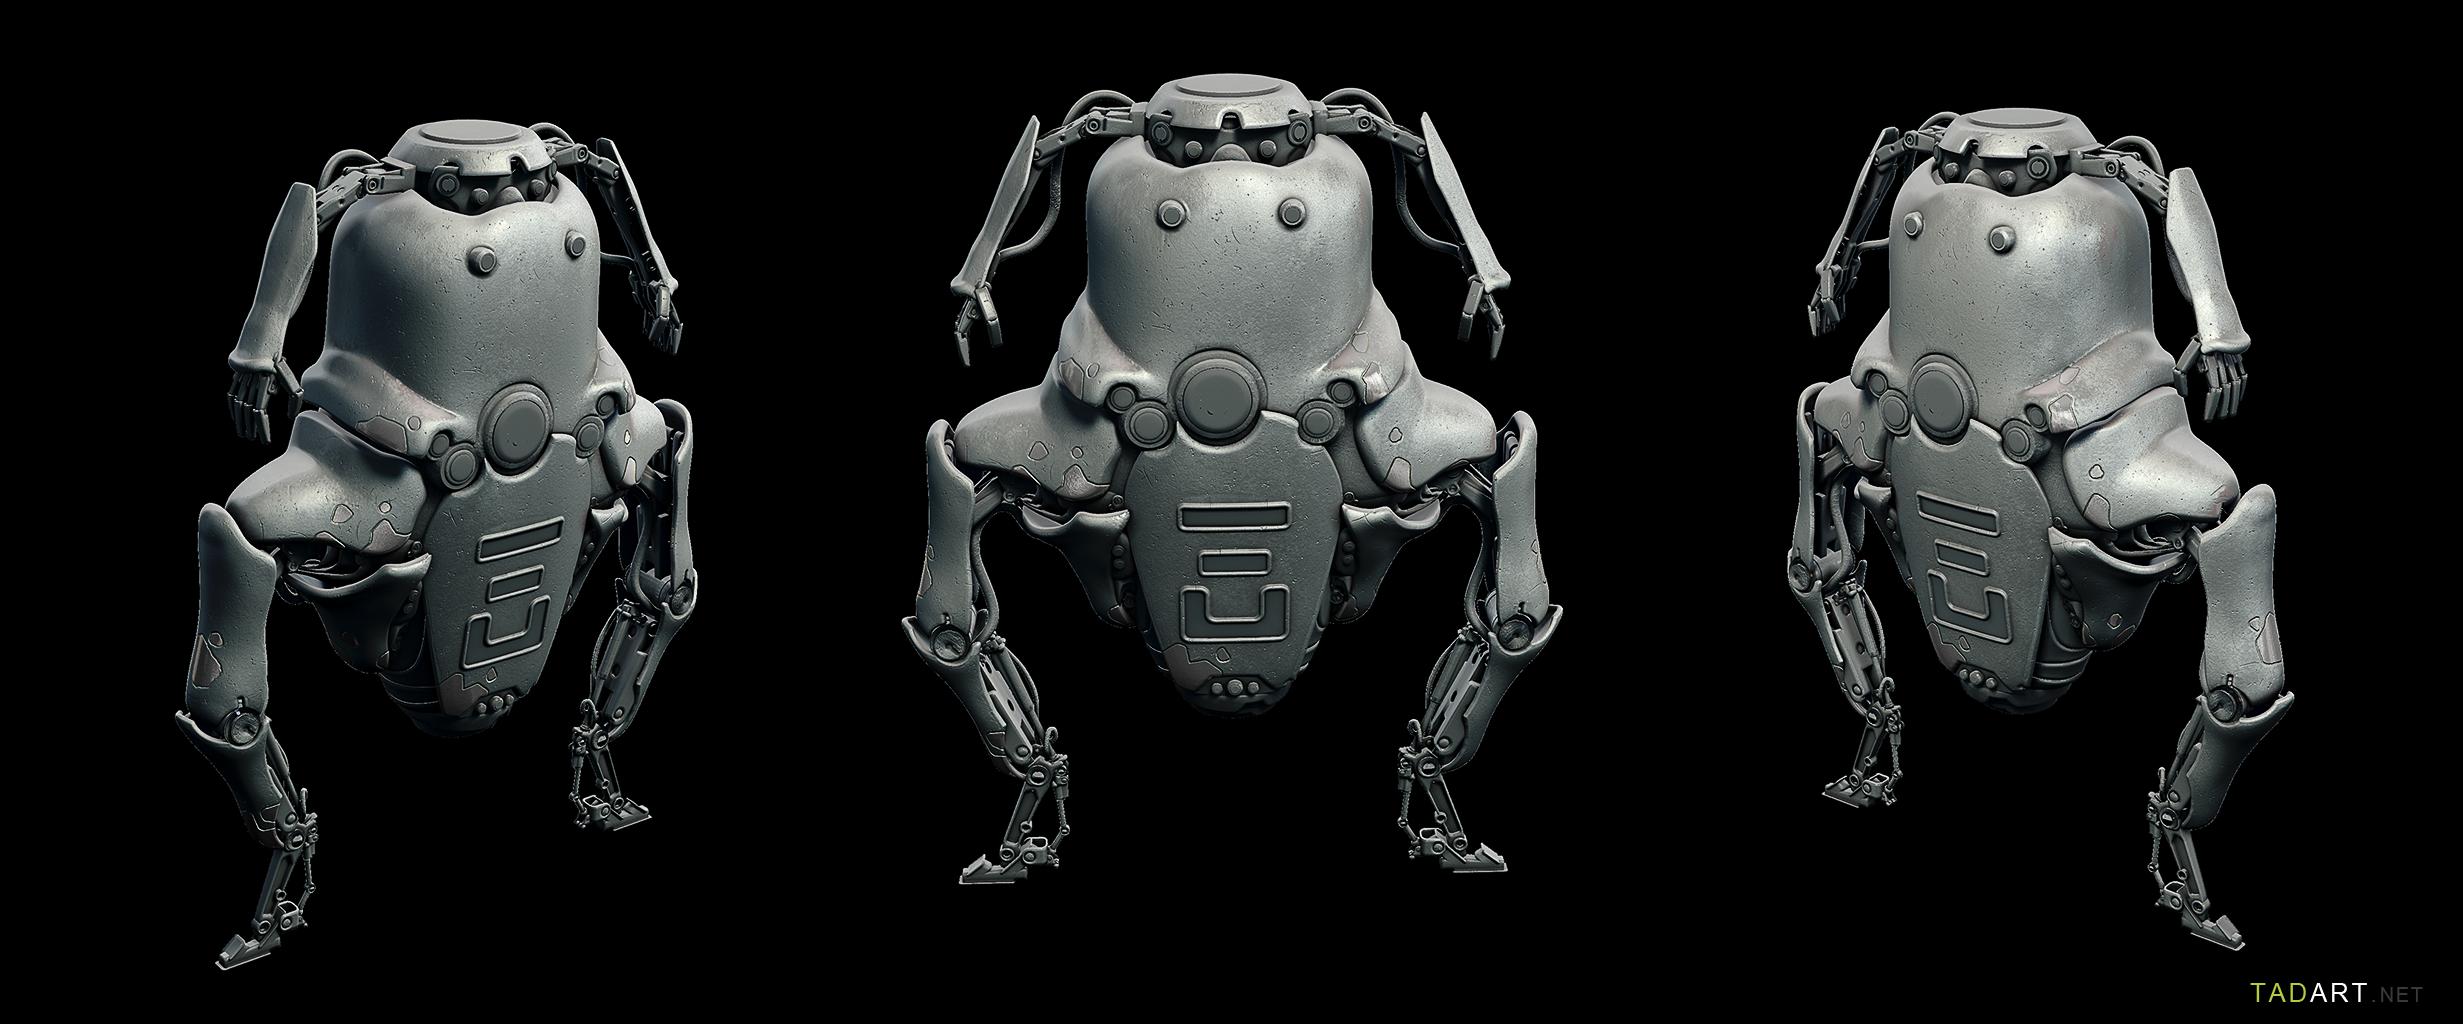 Robot_greylow.png